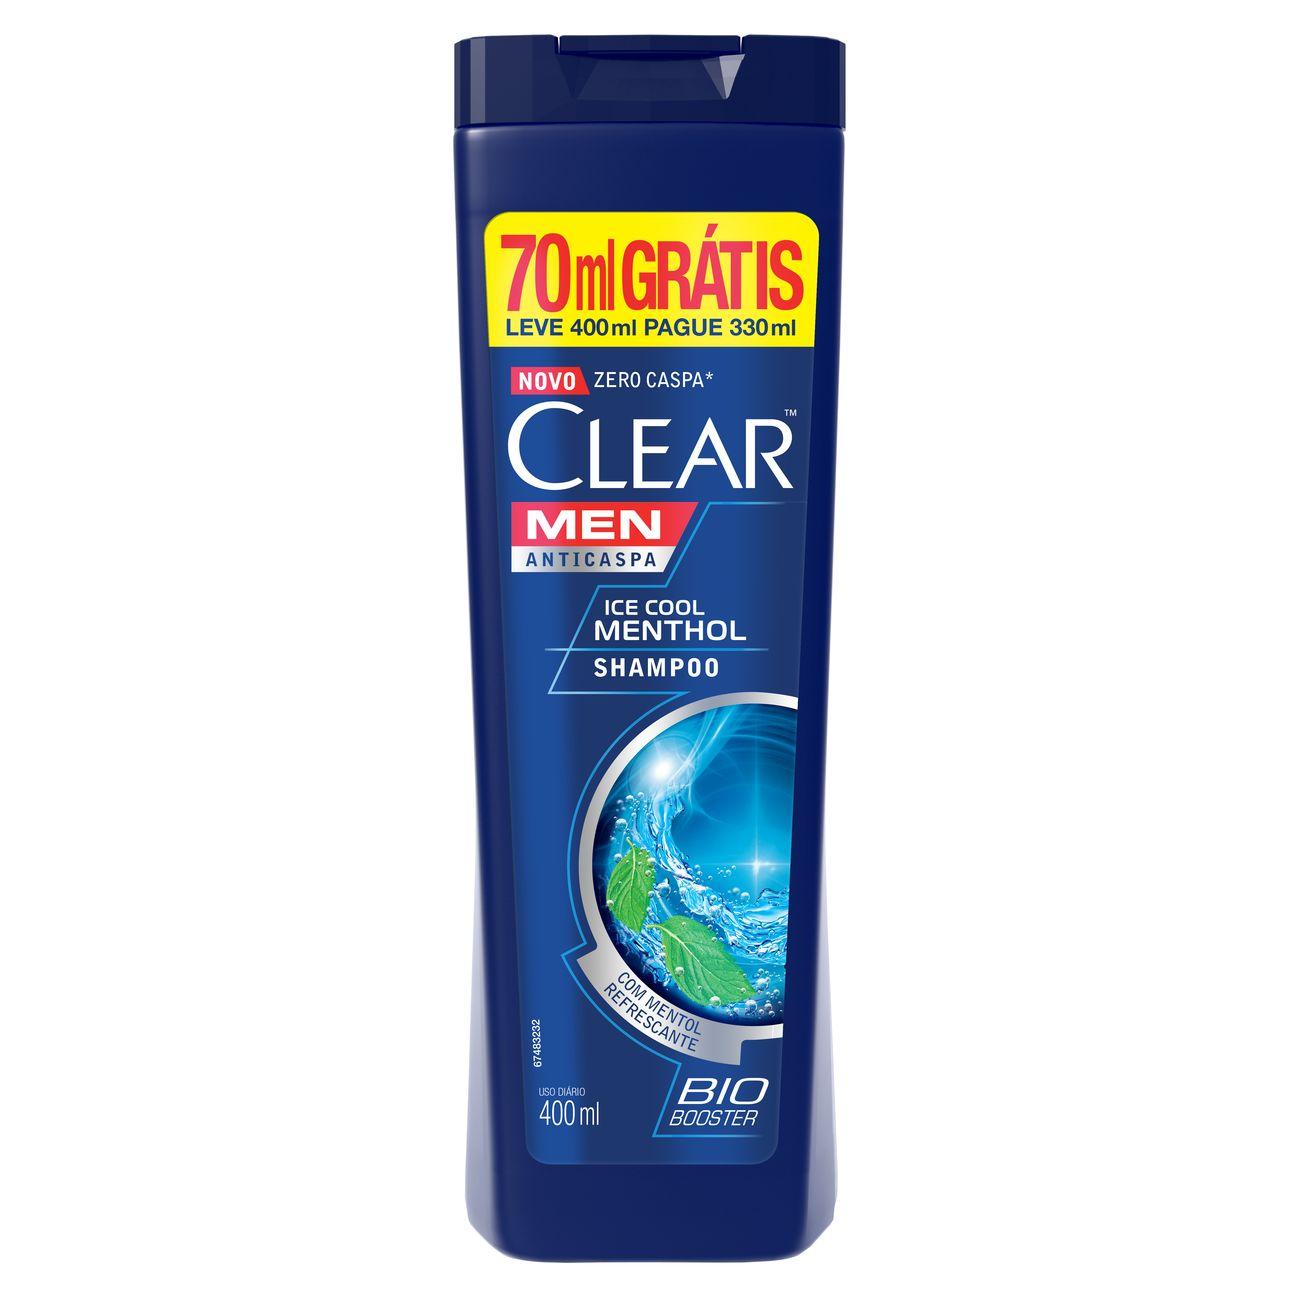 Oferta Shampoo Anticaspa Clear IceCool Menthol Pague 330ml Leve 400ml